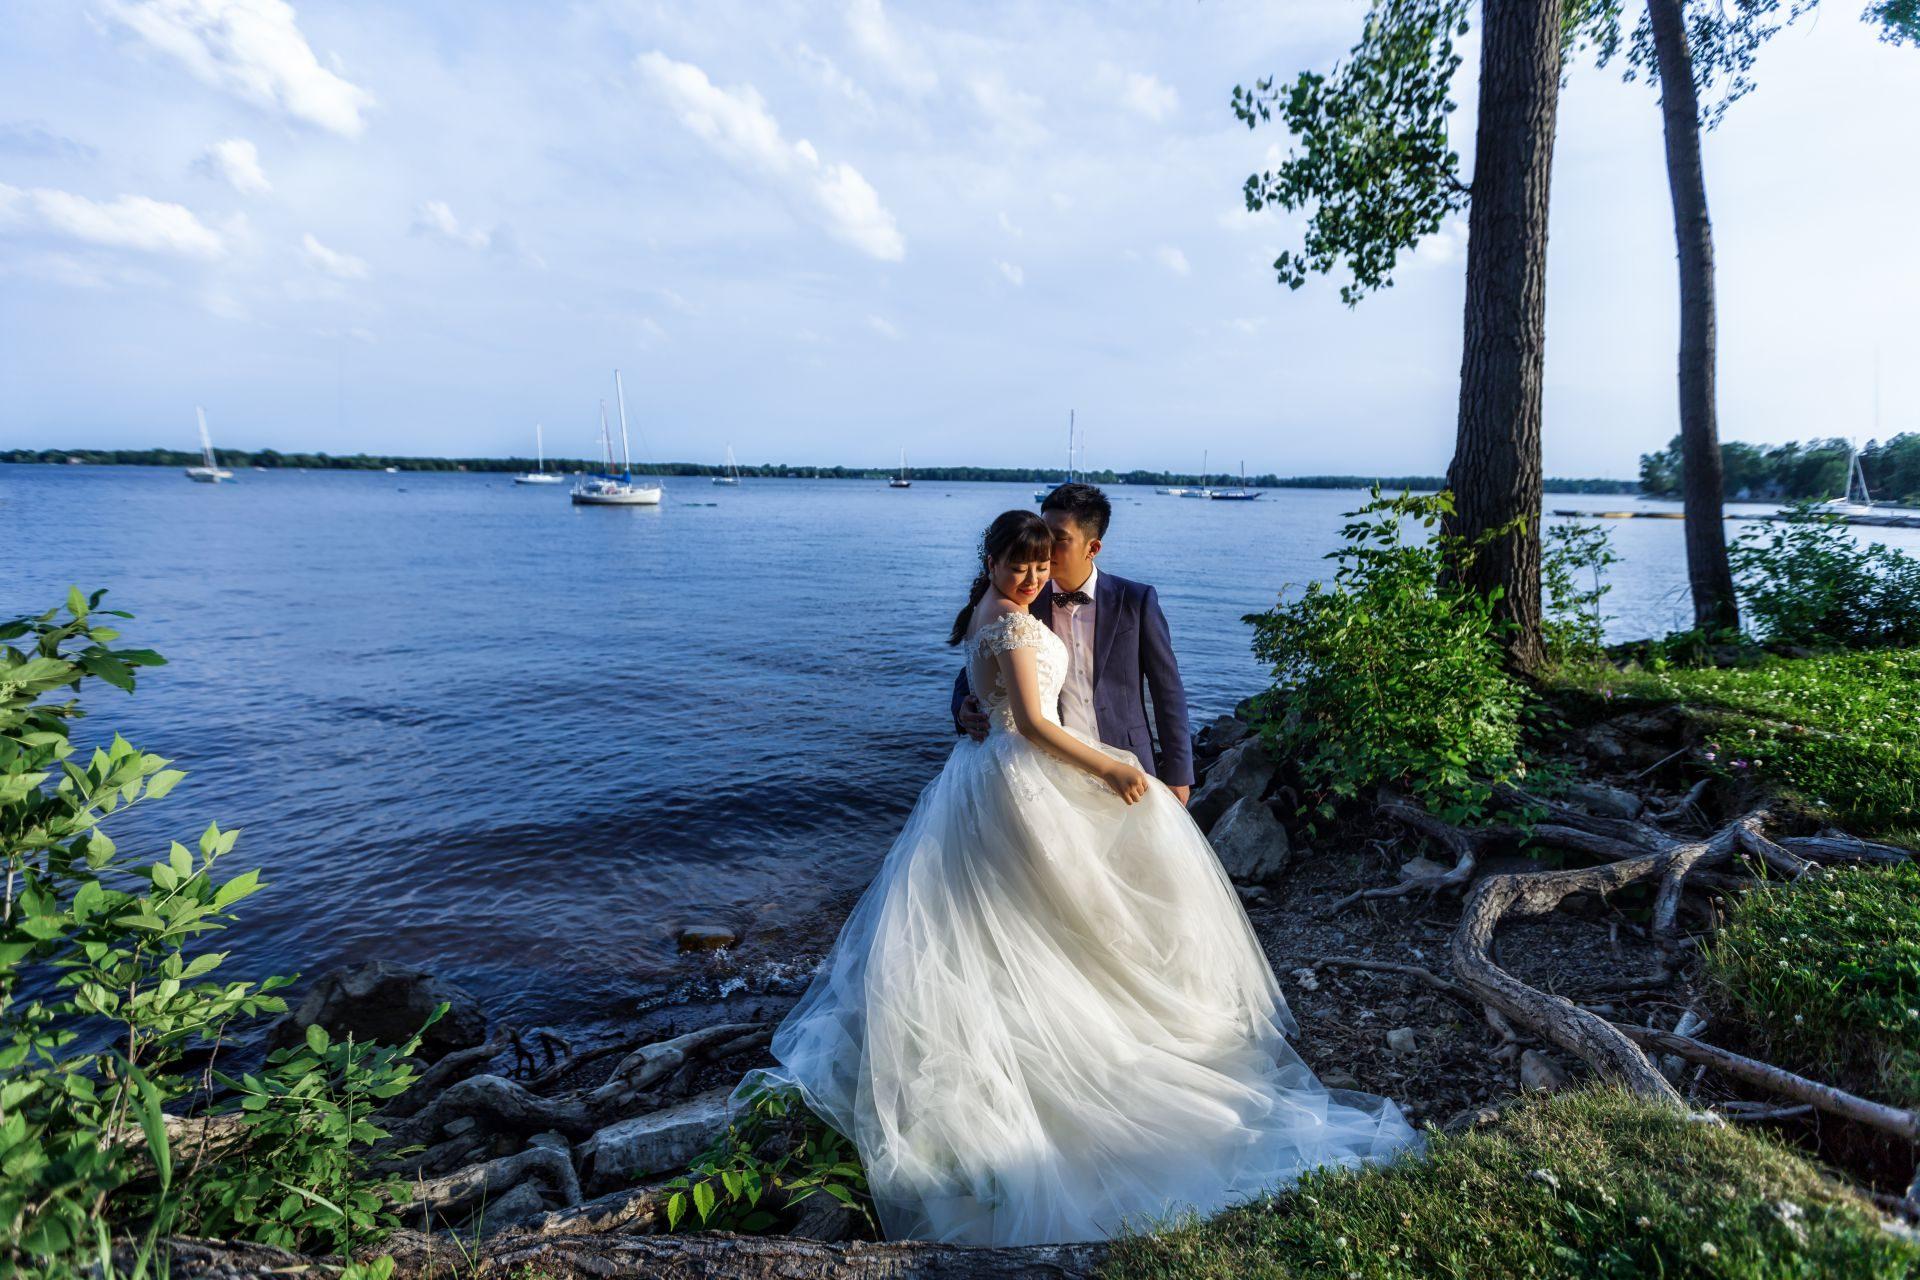 加拿大婚紗-maomao-montreal-海外婚紗 - 加拿大婚紗